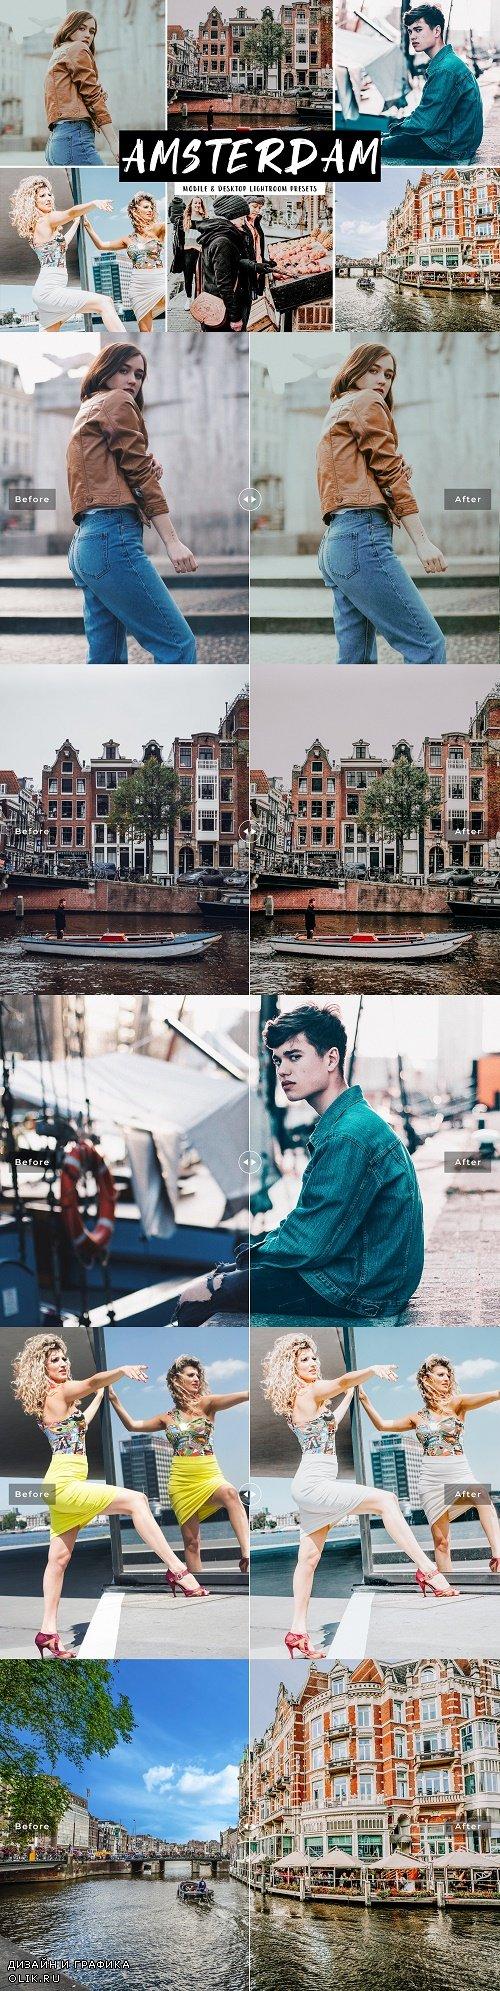 Amsterdam LRM Presets Pack - 3868912